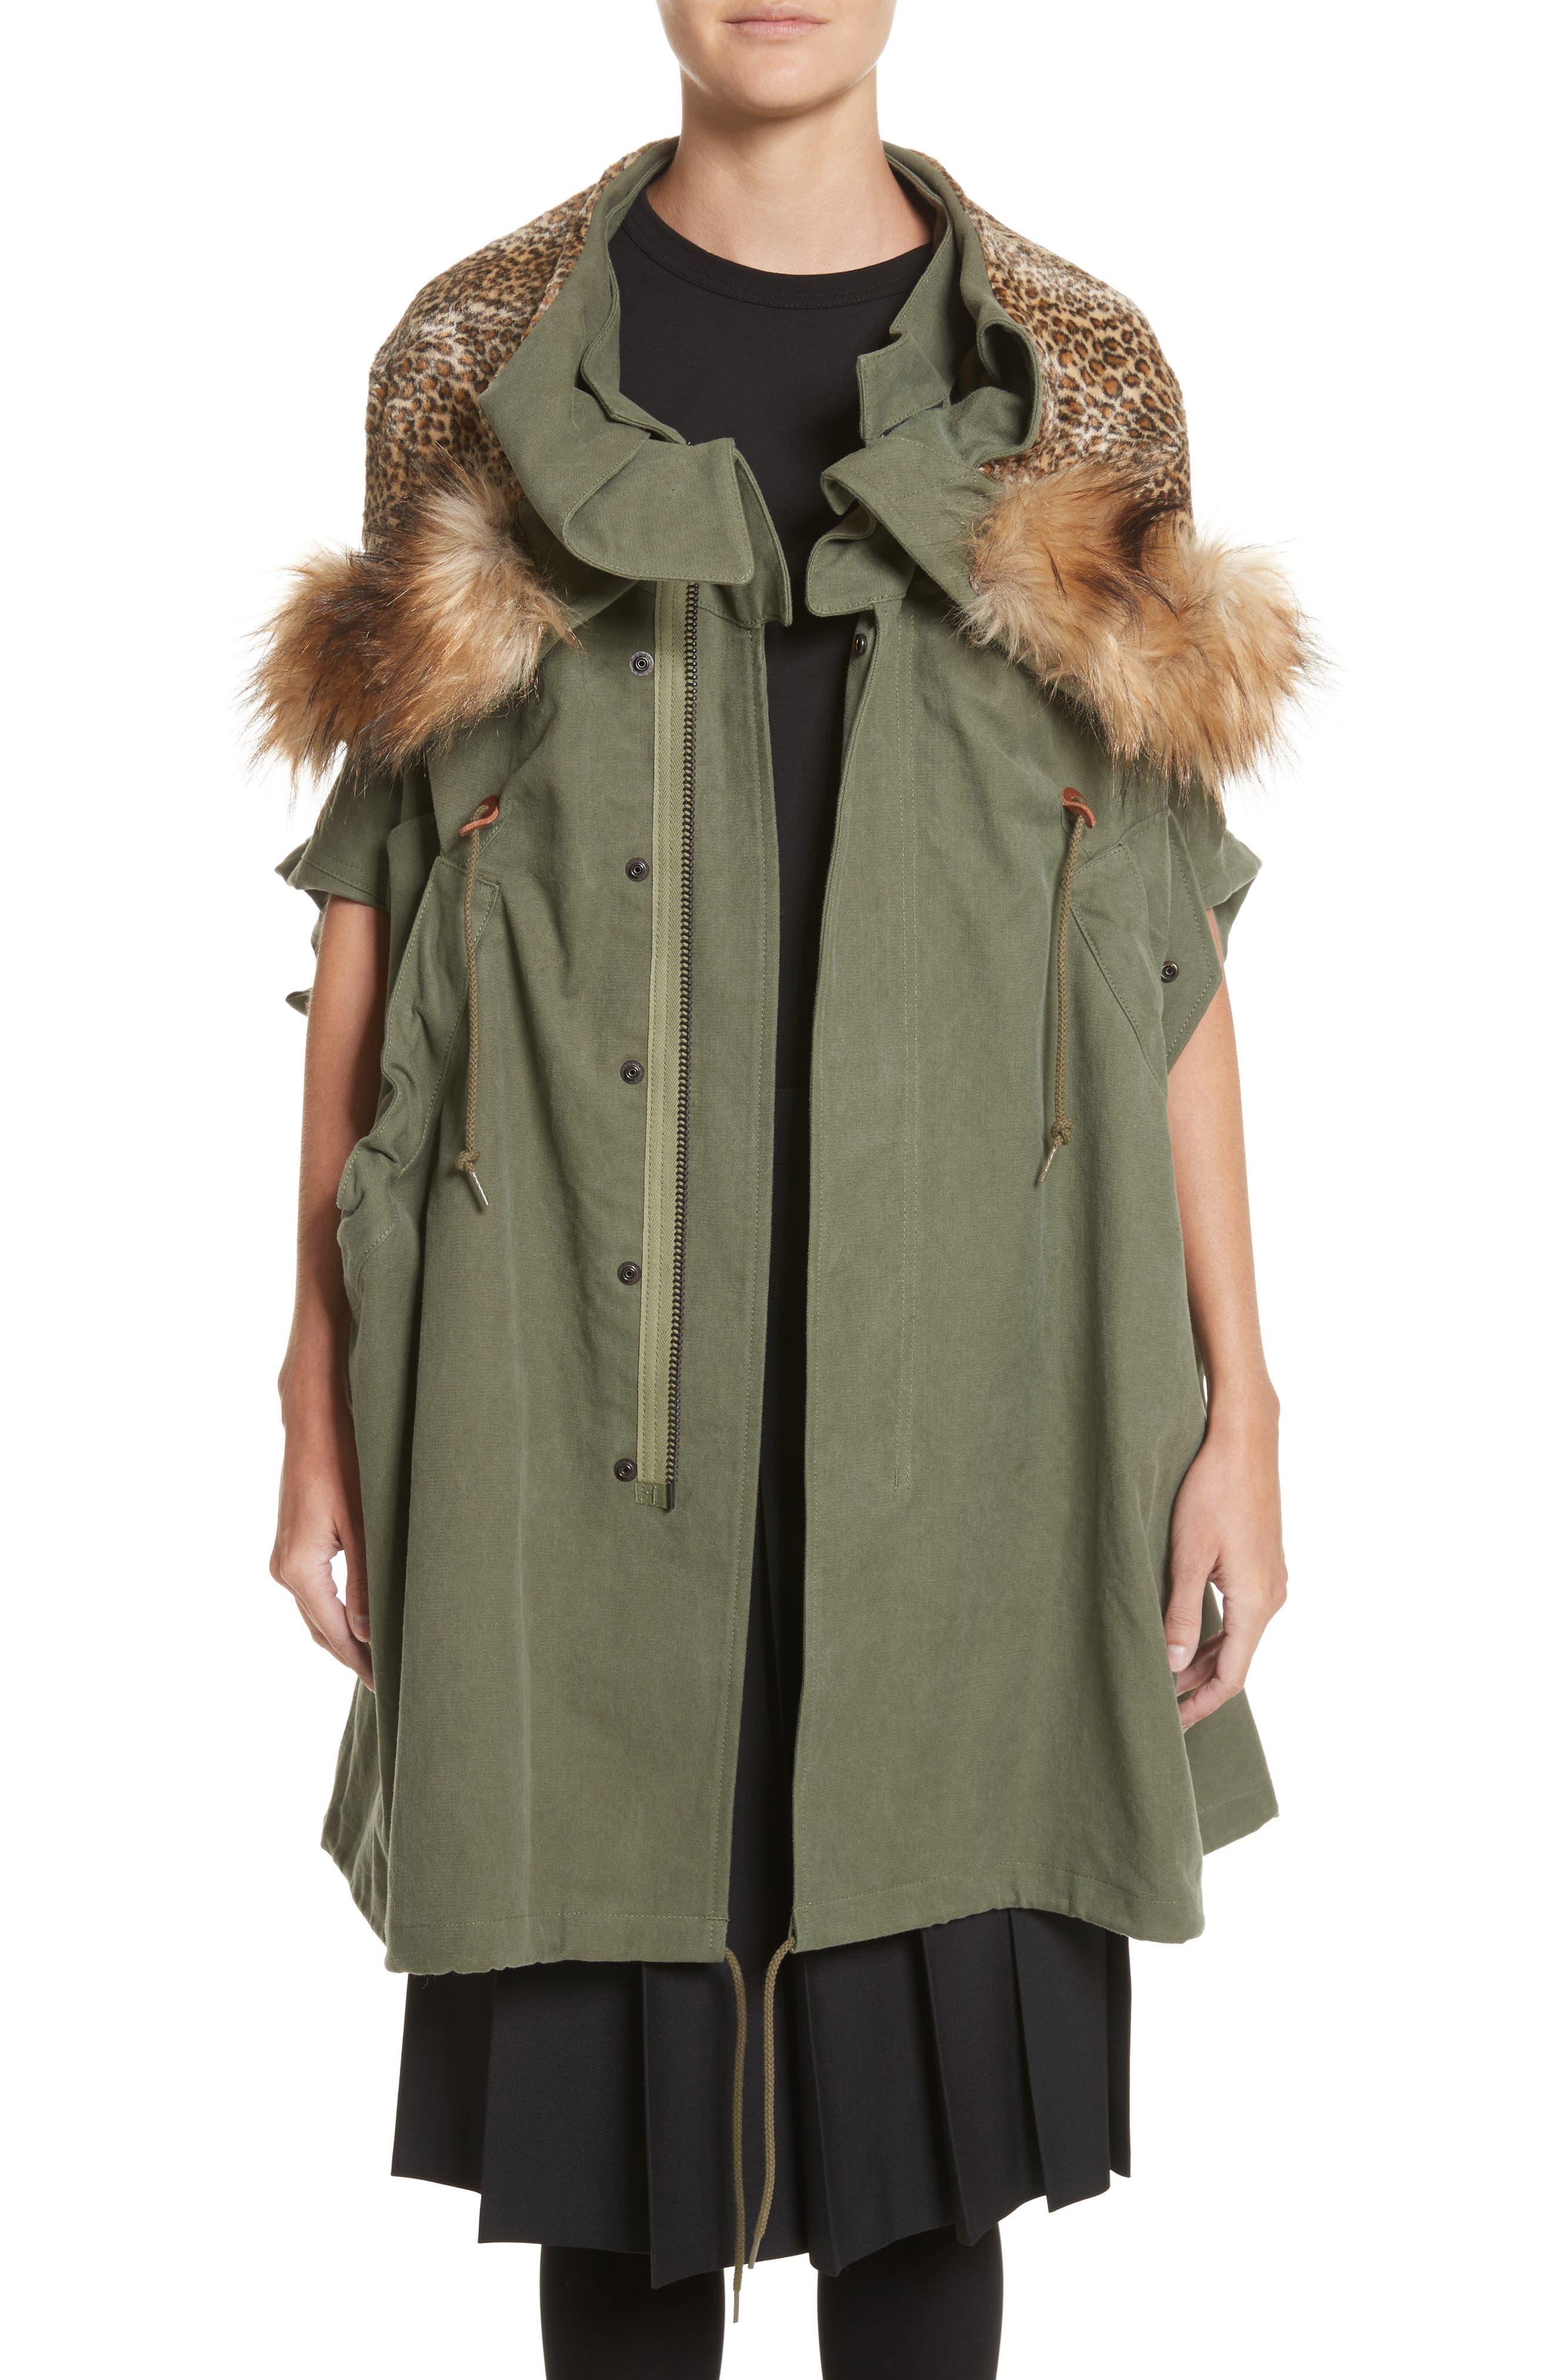 Alternate Image 1 Selected - Junya Watanabe Army Coat with Cheetah Faux Fur Hood